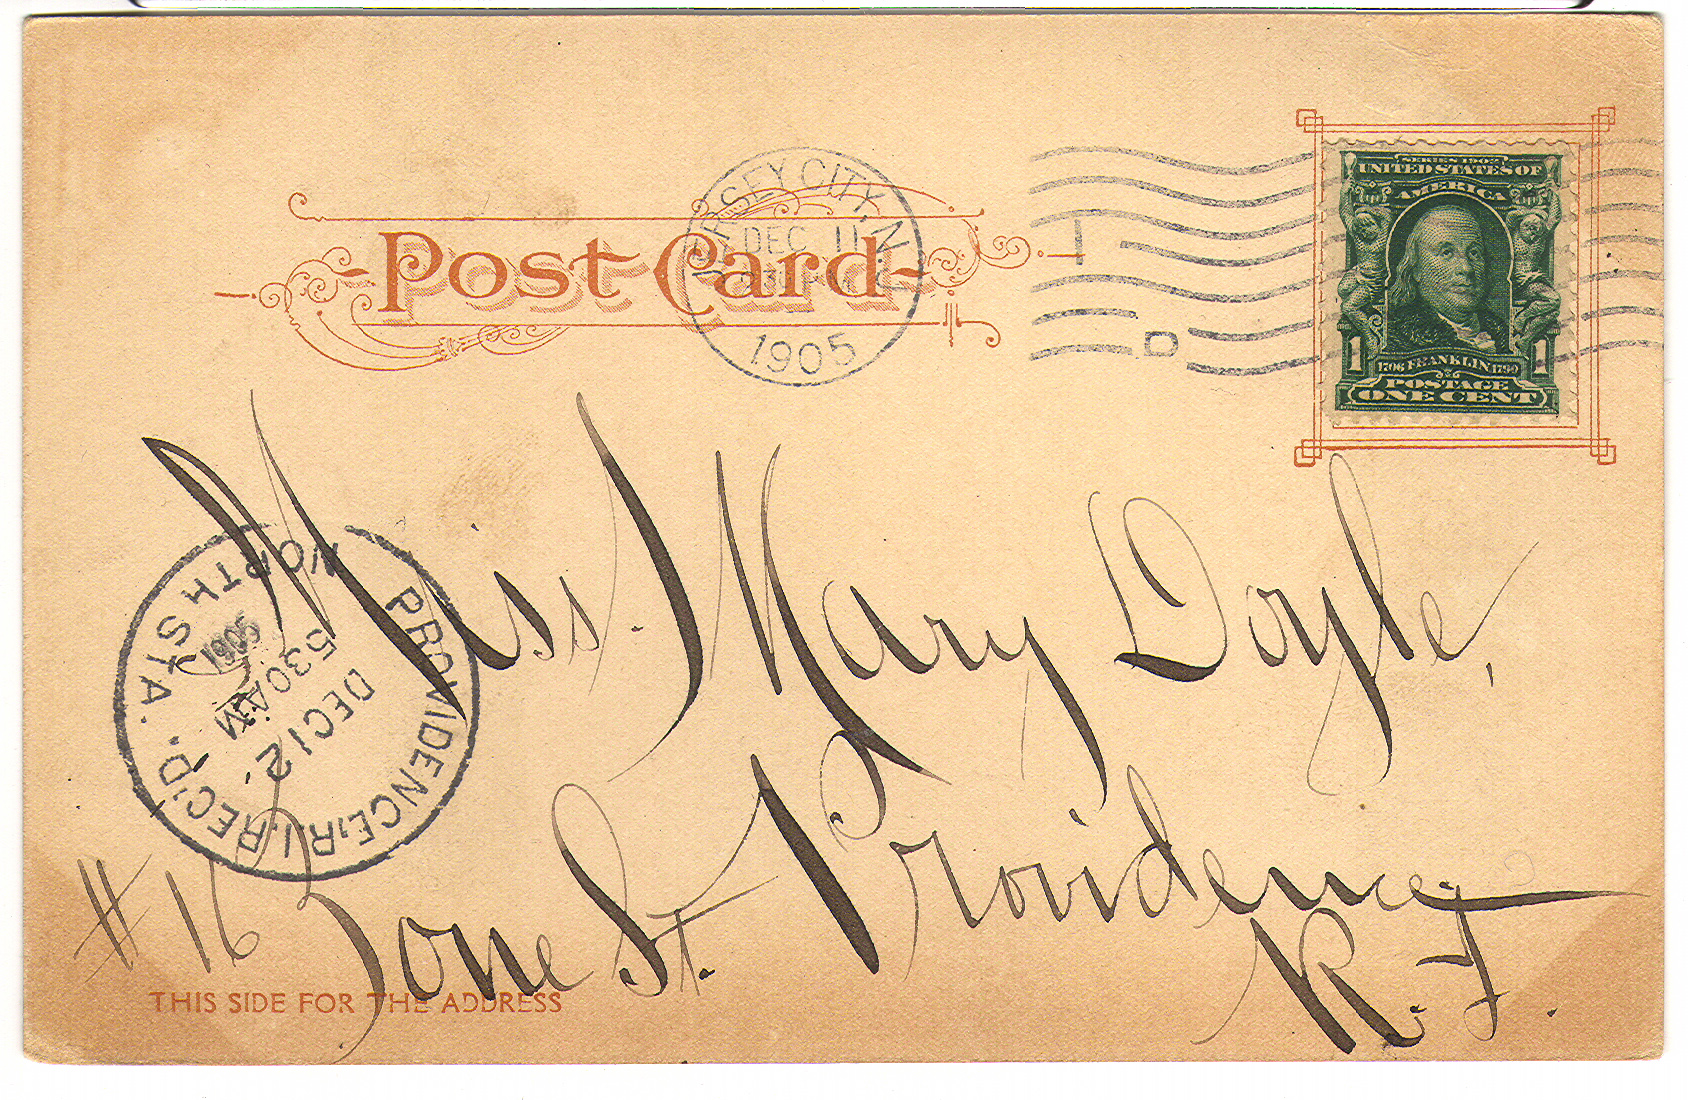 Postcard by Susan S